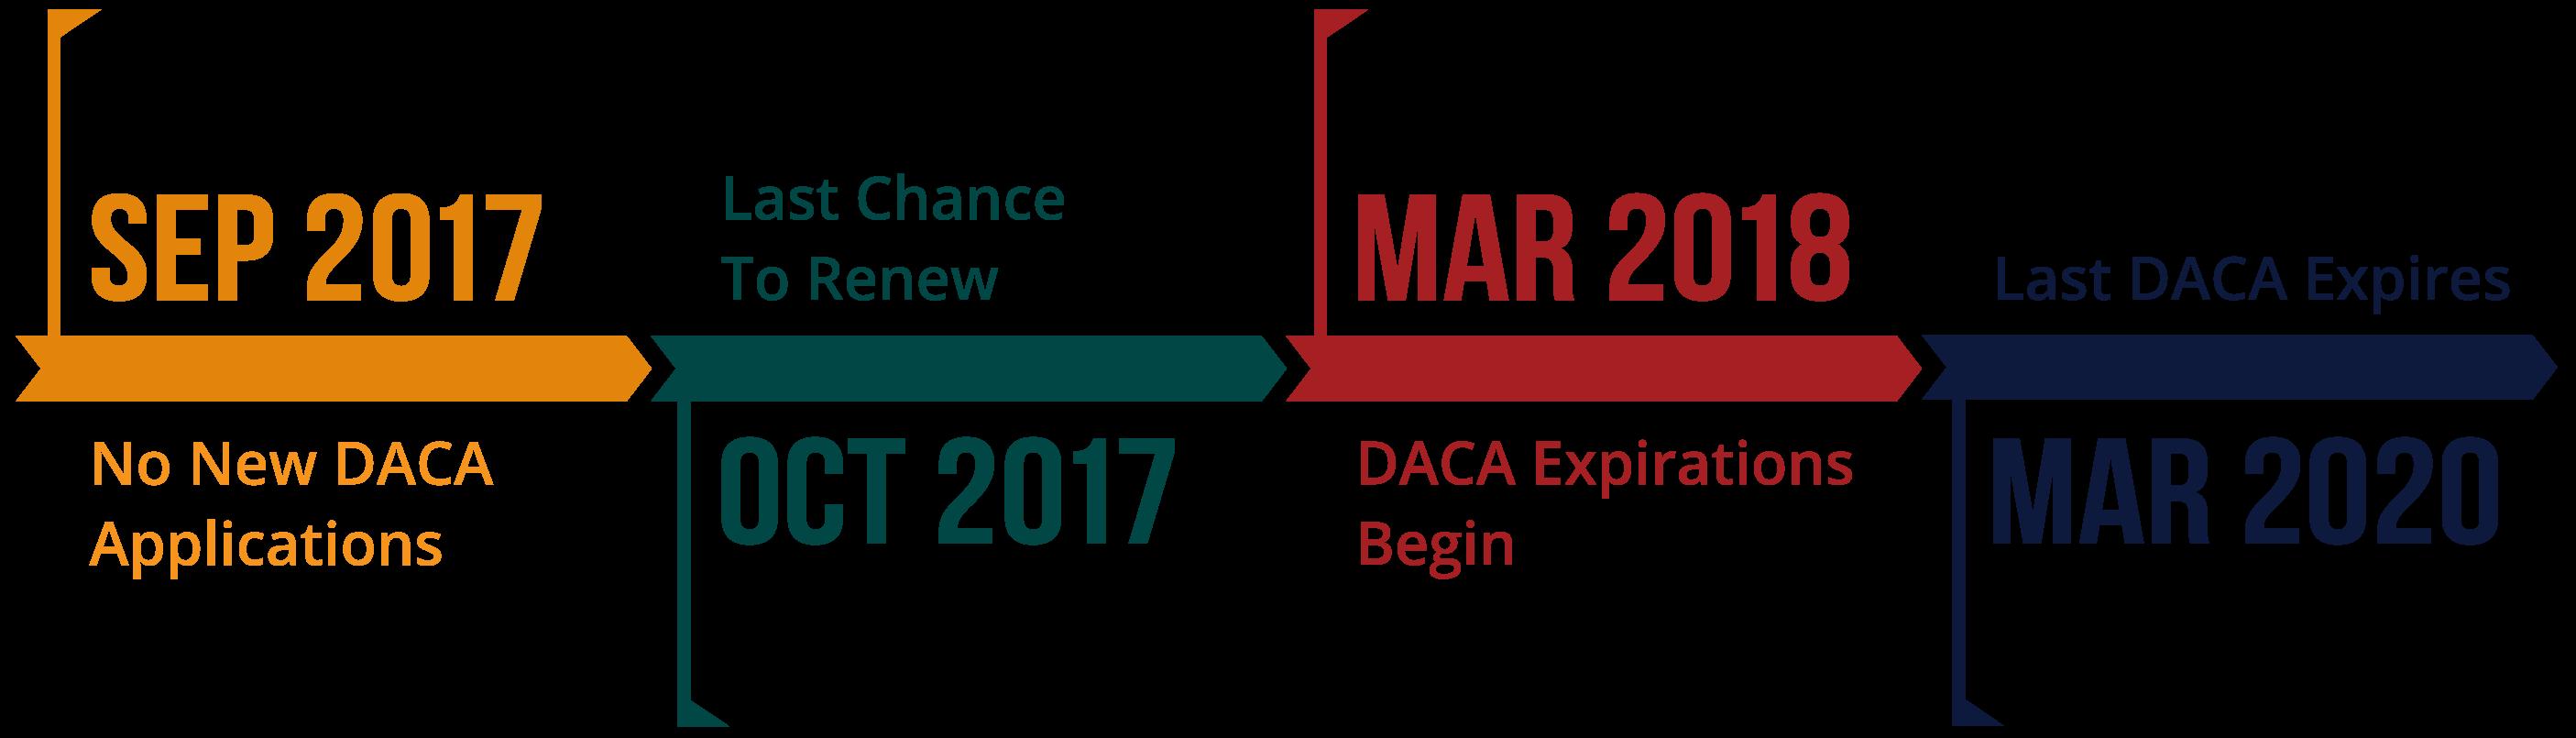 DACA Timeline